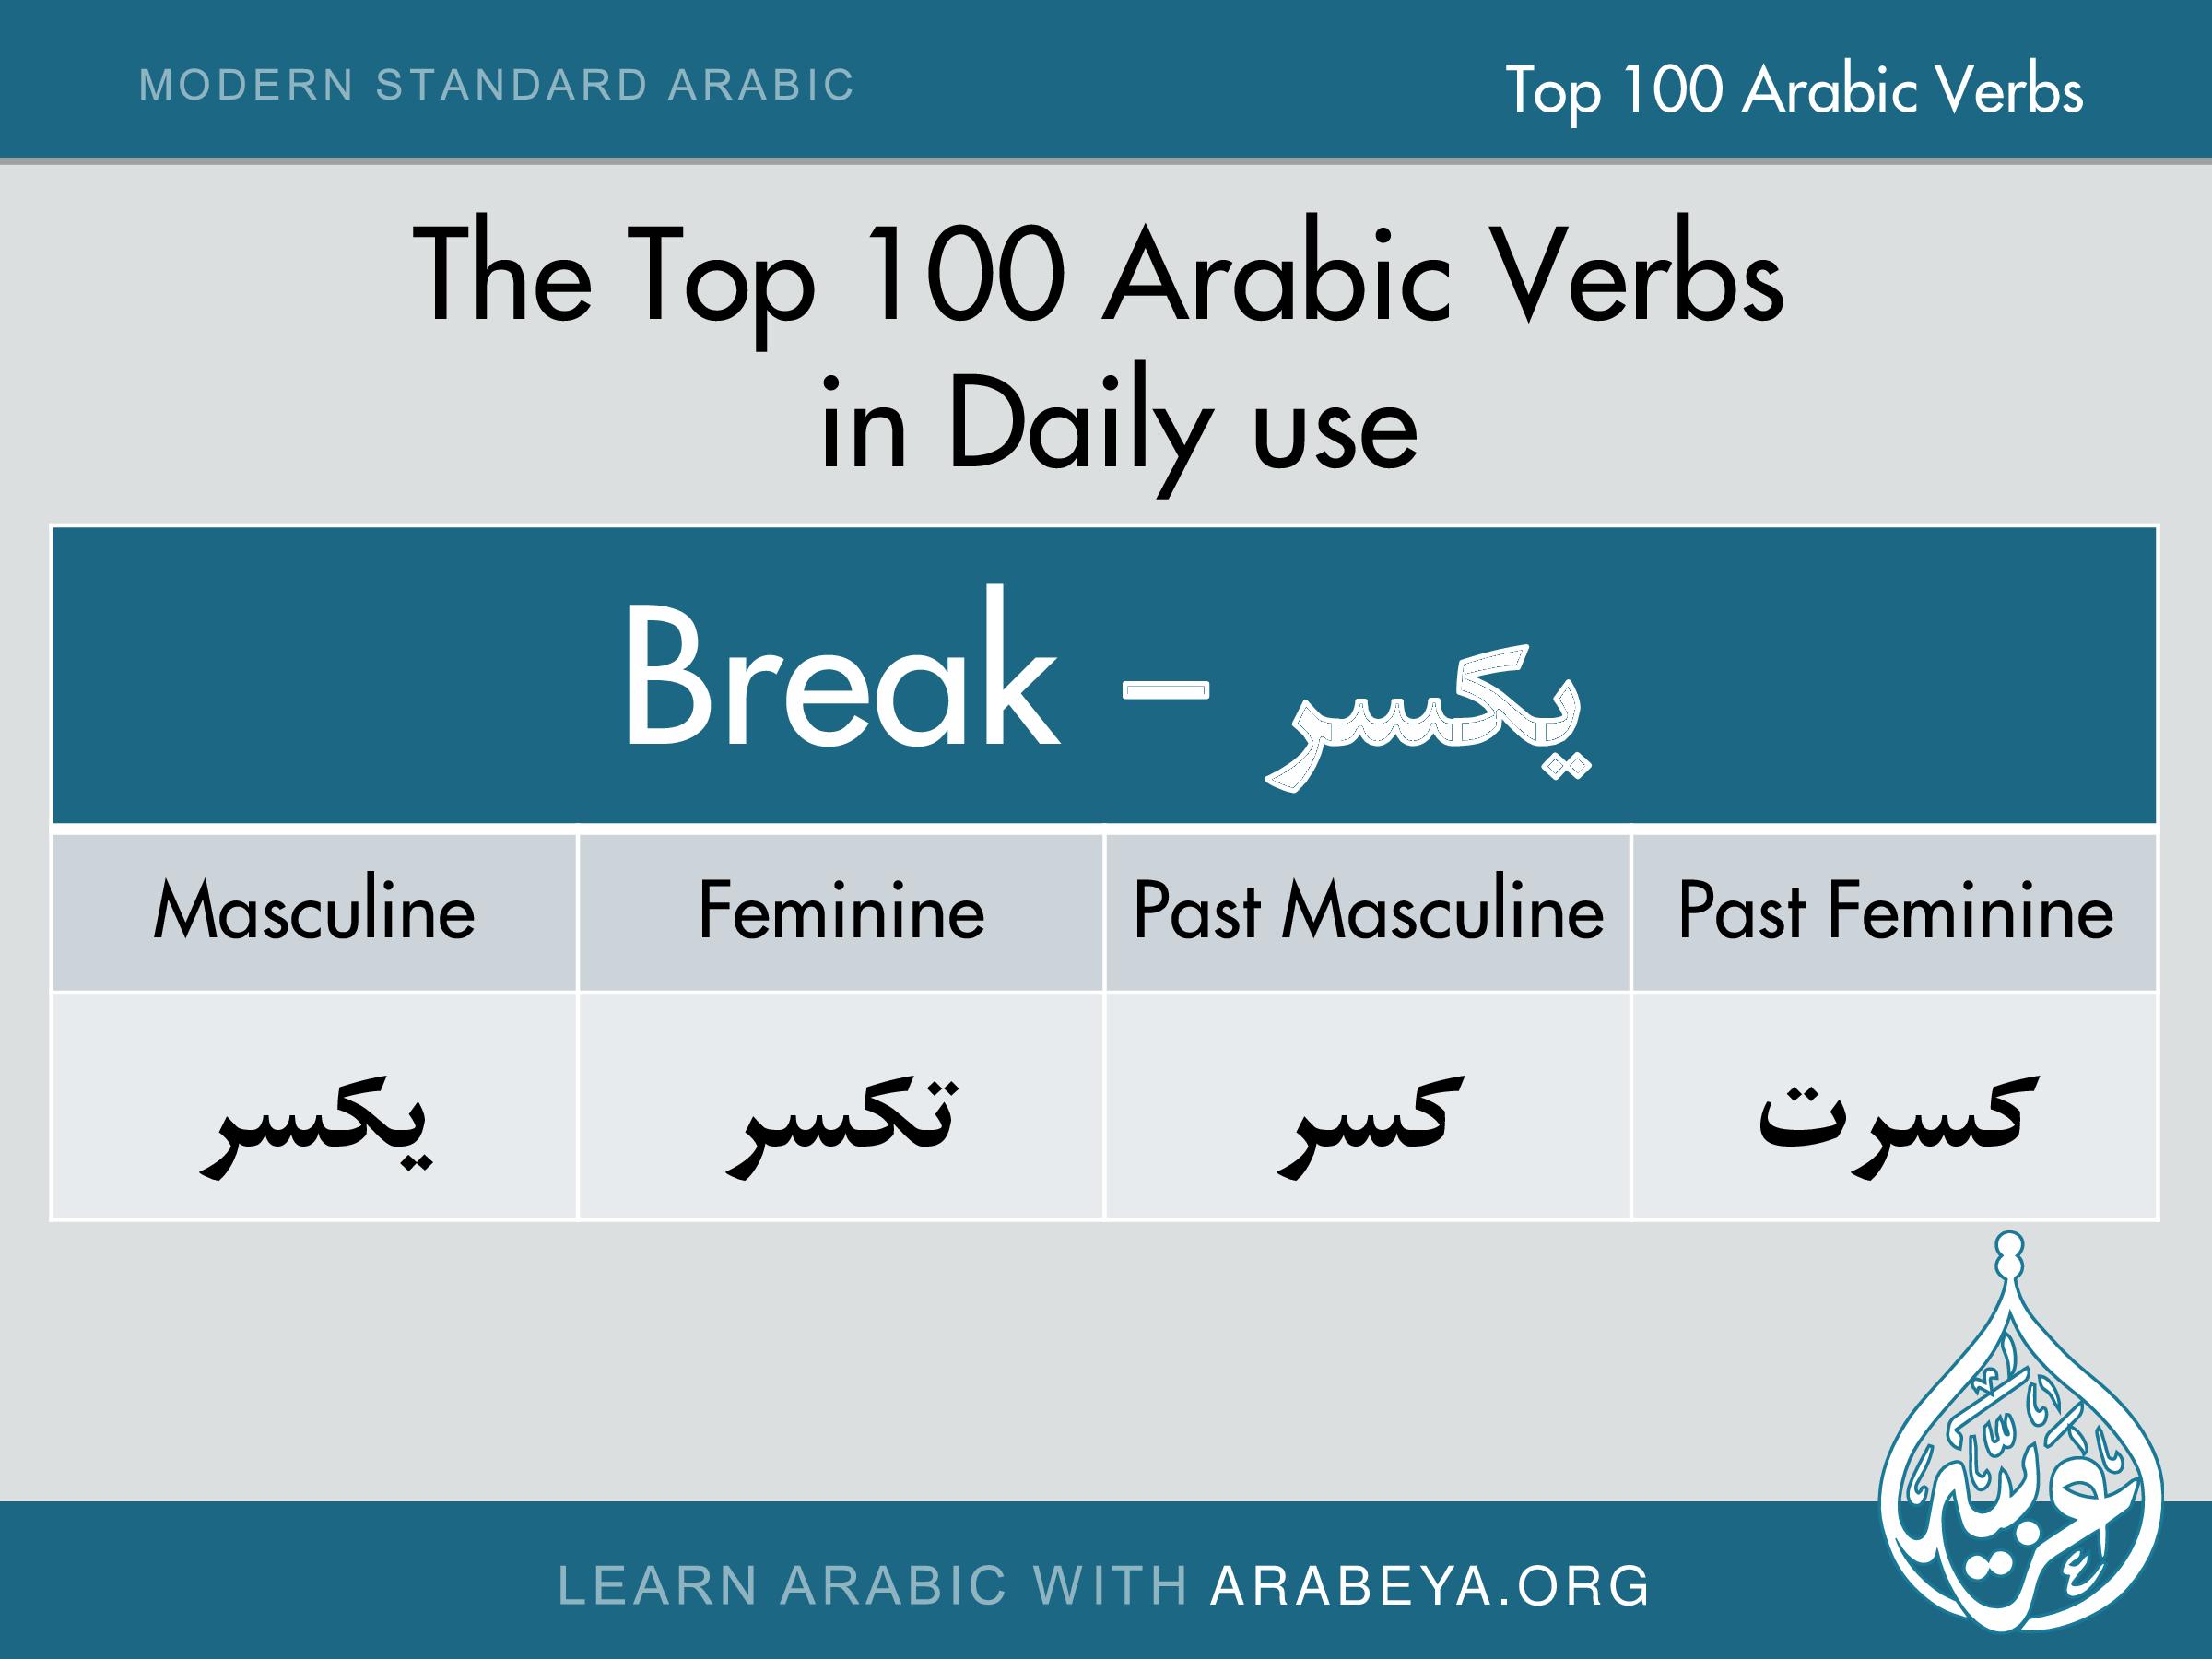 Pin By Arabeya Arabic Language Center On Top 100 Arabic